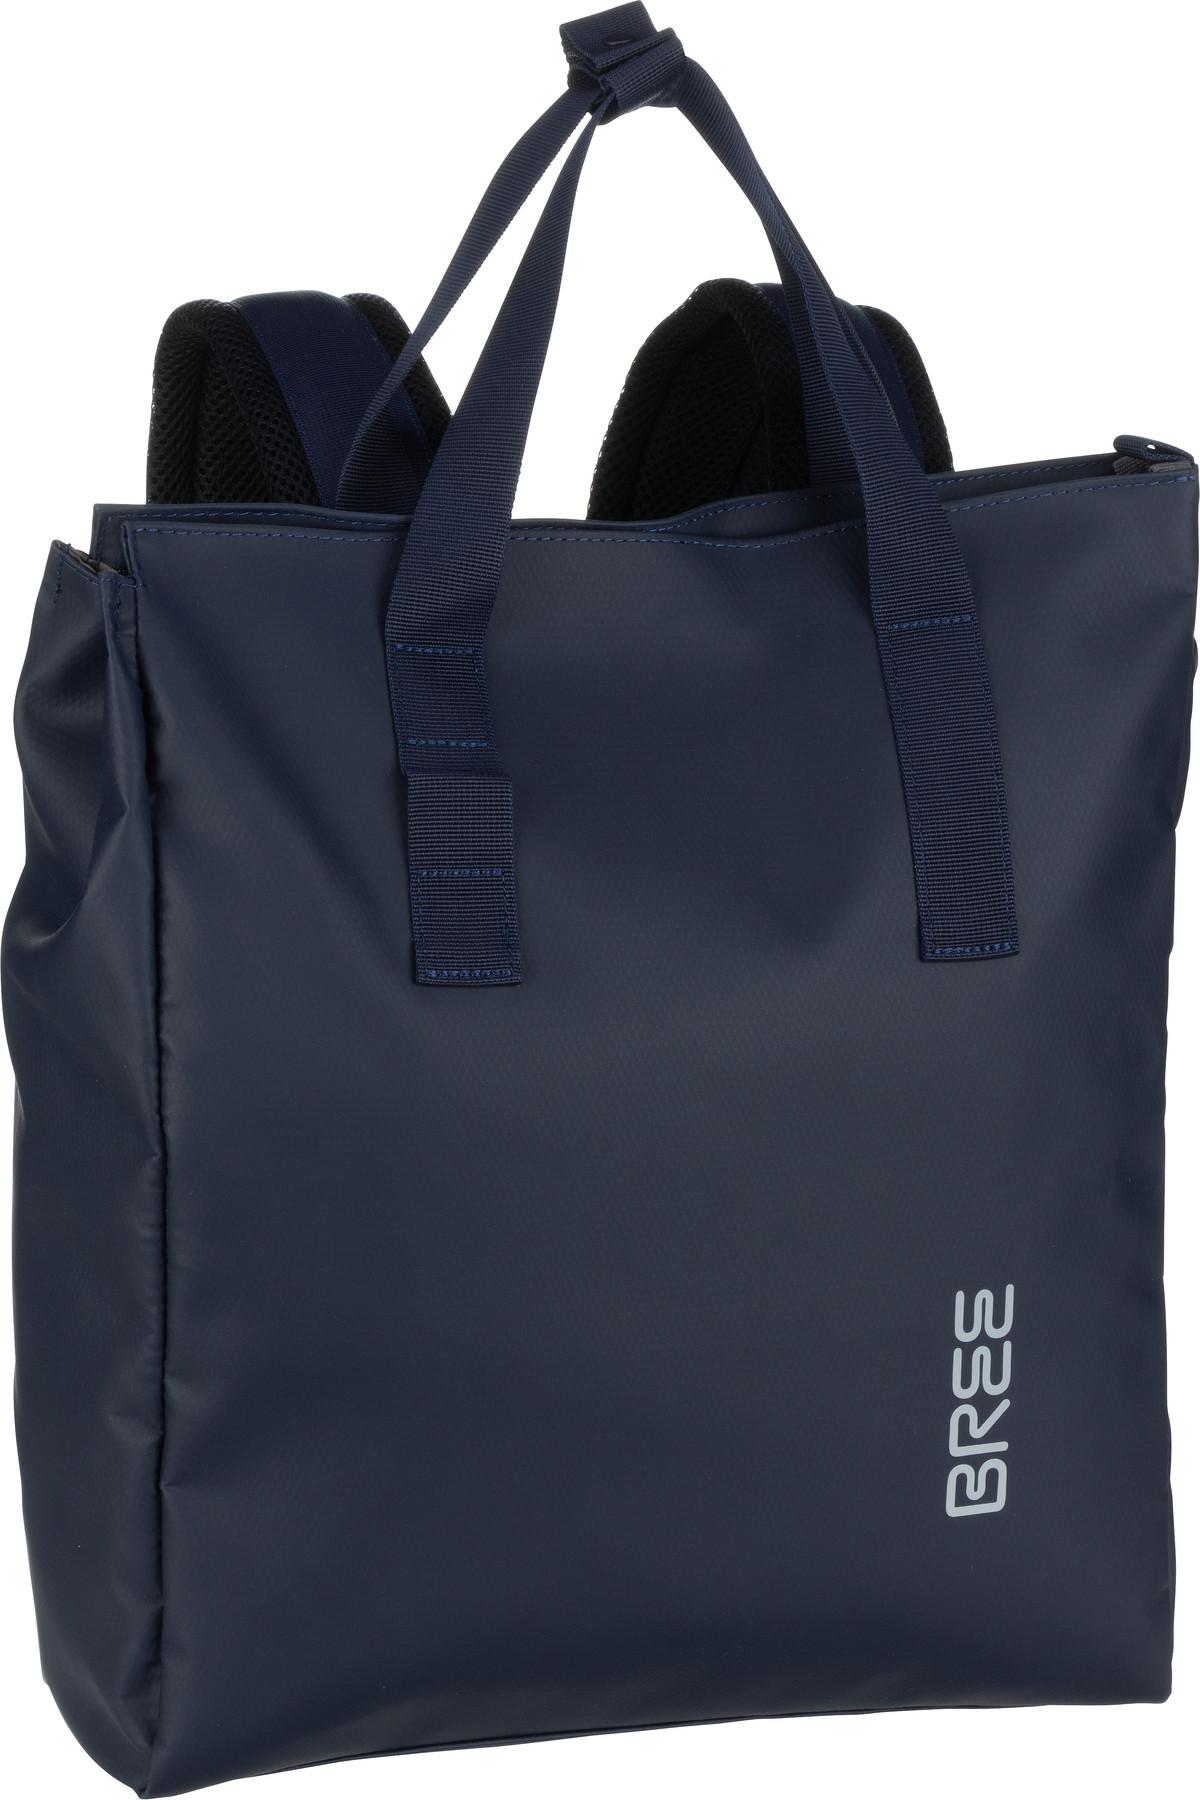 Rucksack / Daypack Punch 732 Blue (15 Liter)